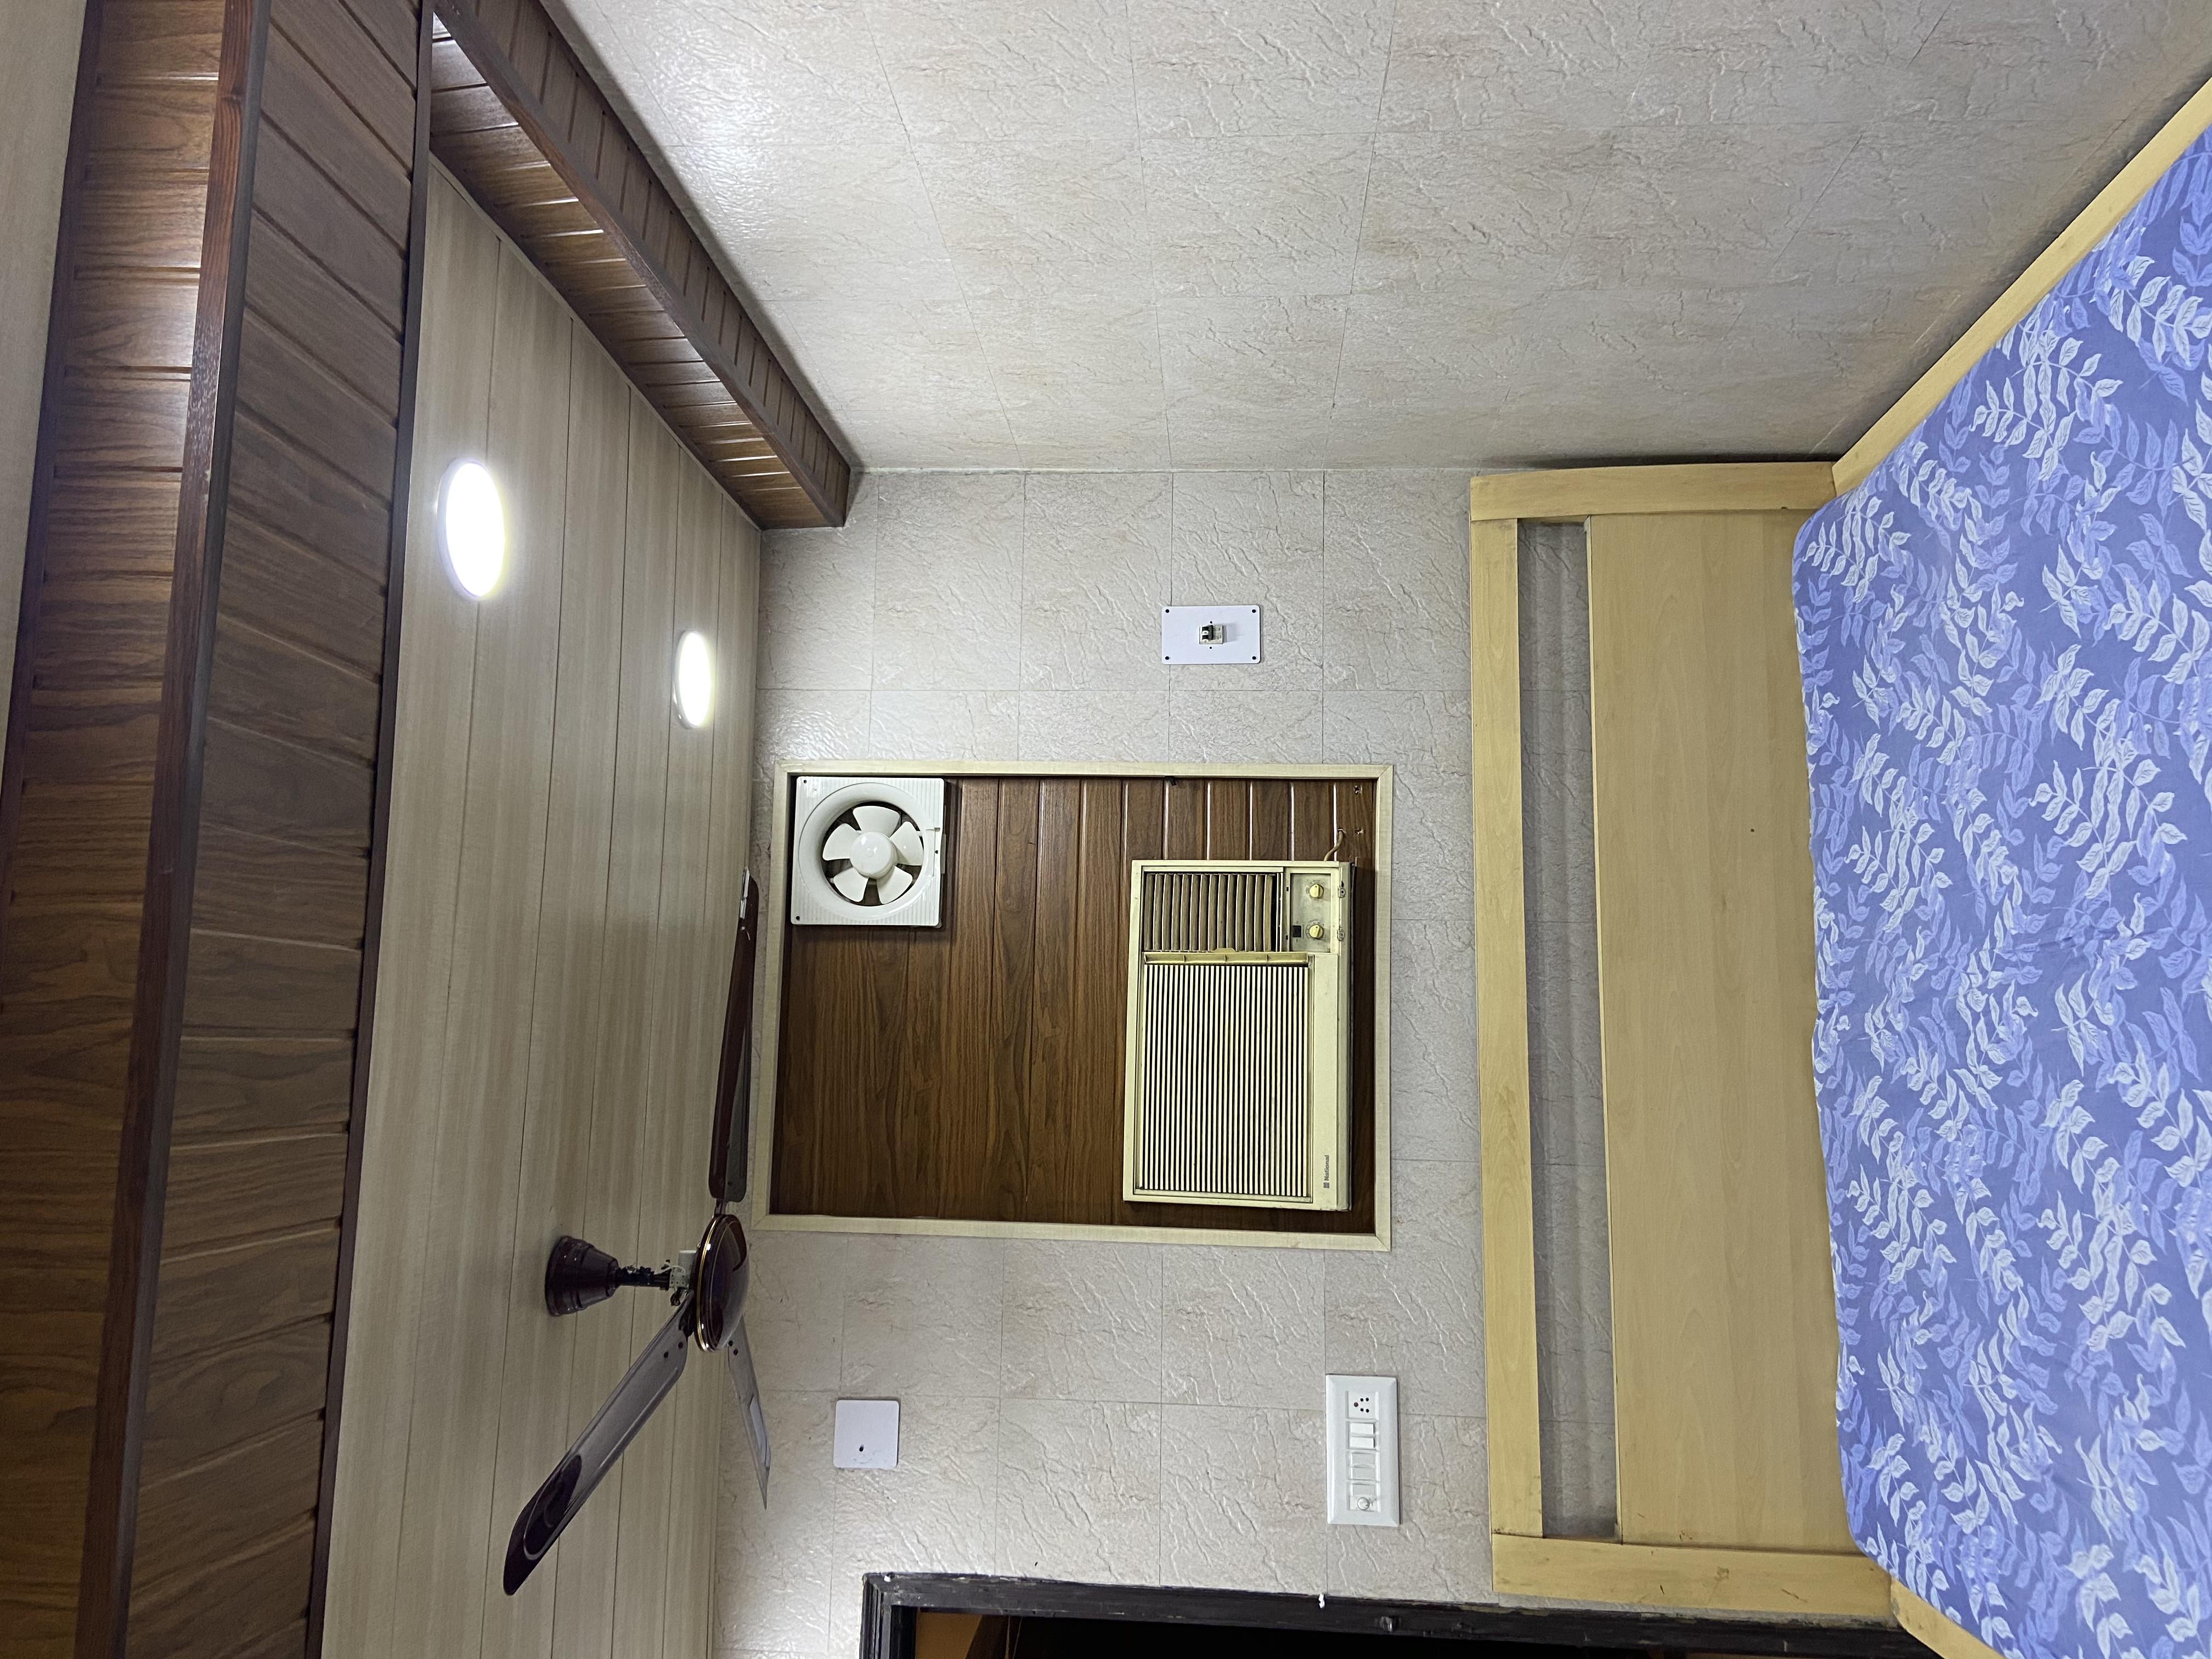 1 BHK 267 Sq.Ft. Apartment For Rent in Rajouri Garden, Rajouri Garden, Delhi